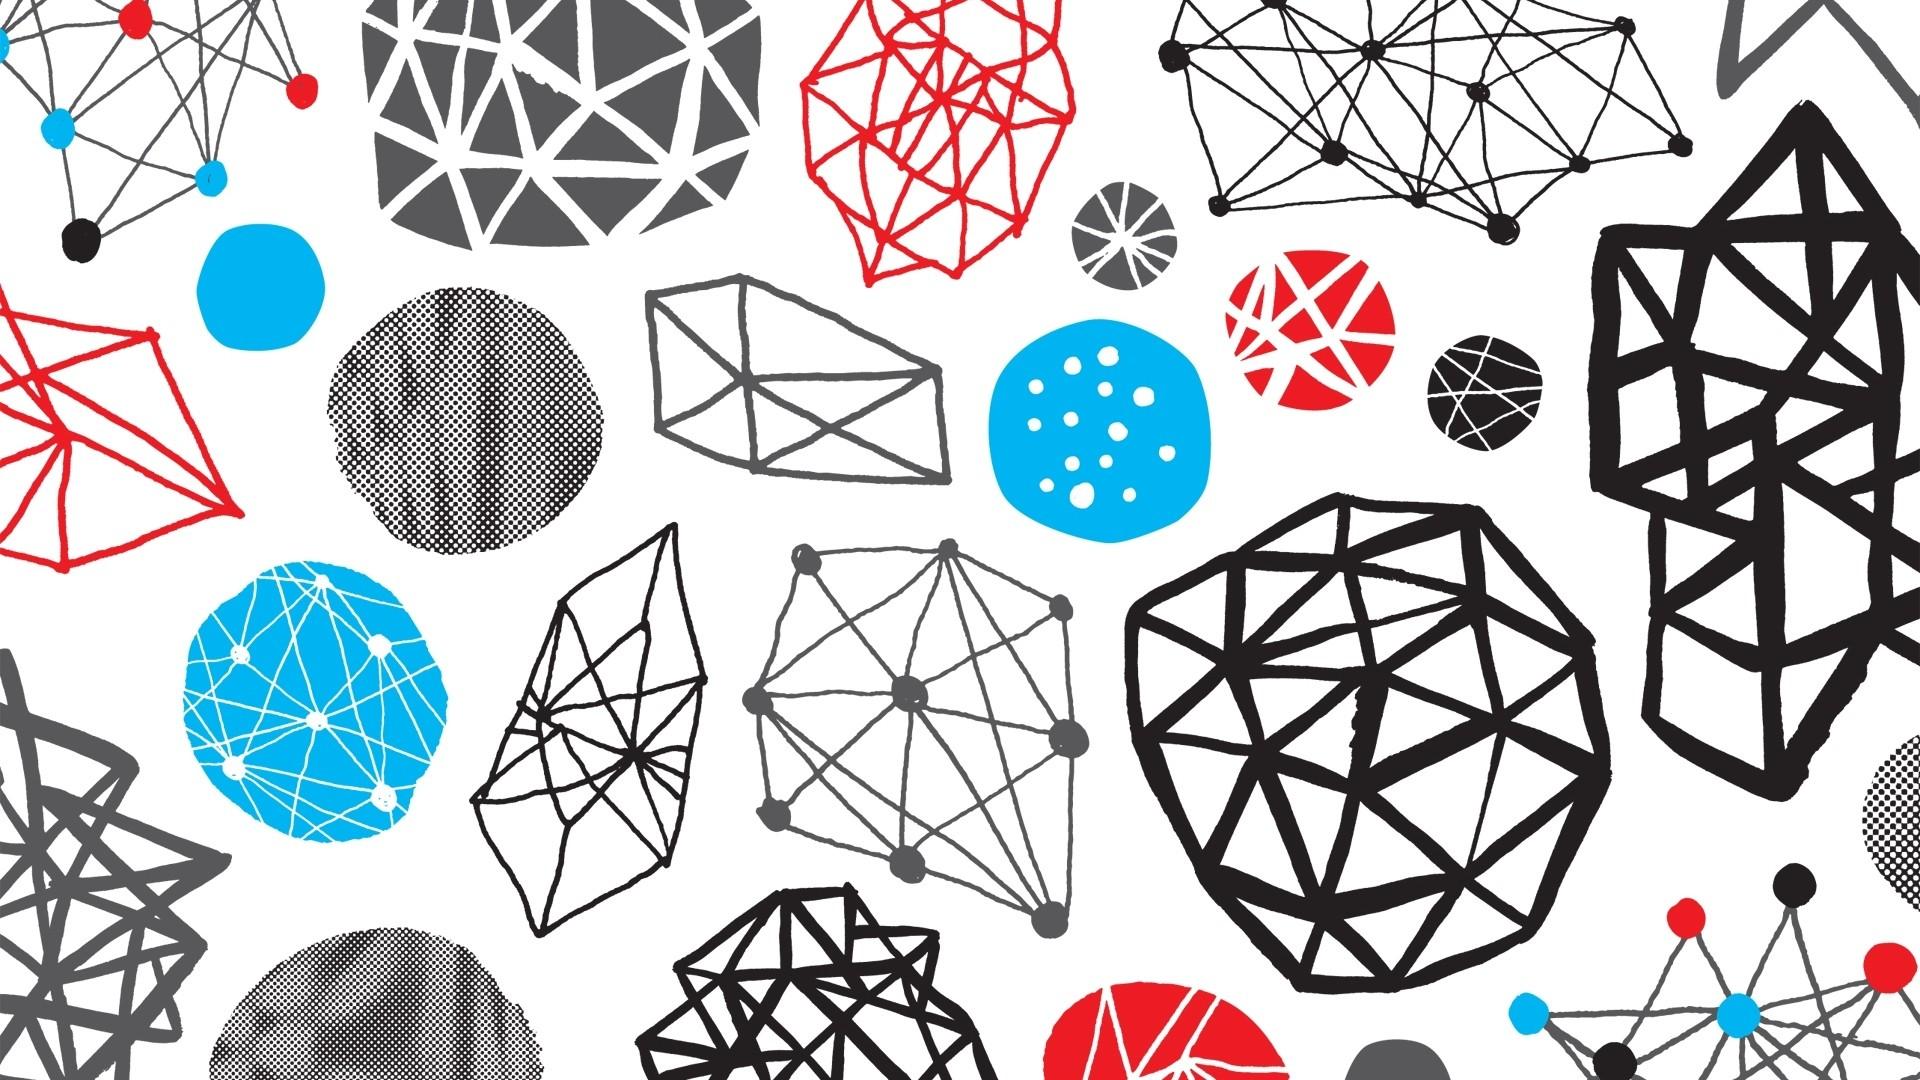 Wallpaper blue, black, red, white, shape, pattern